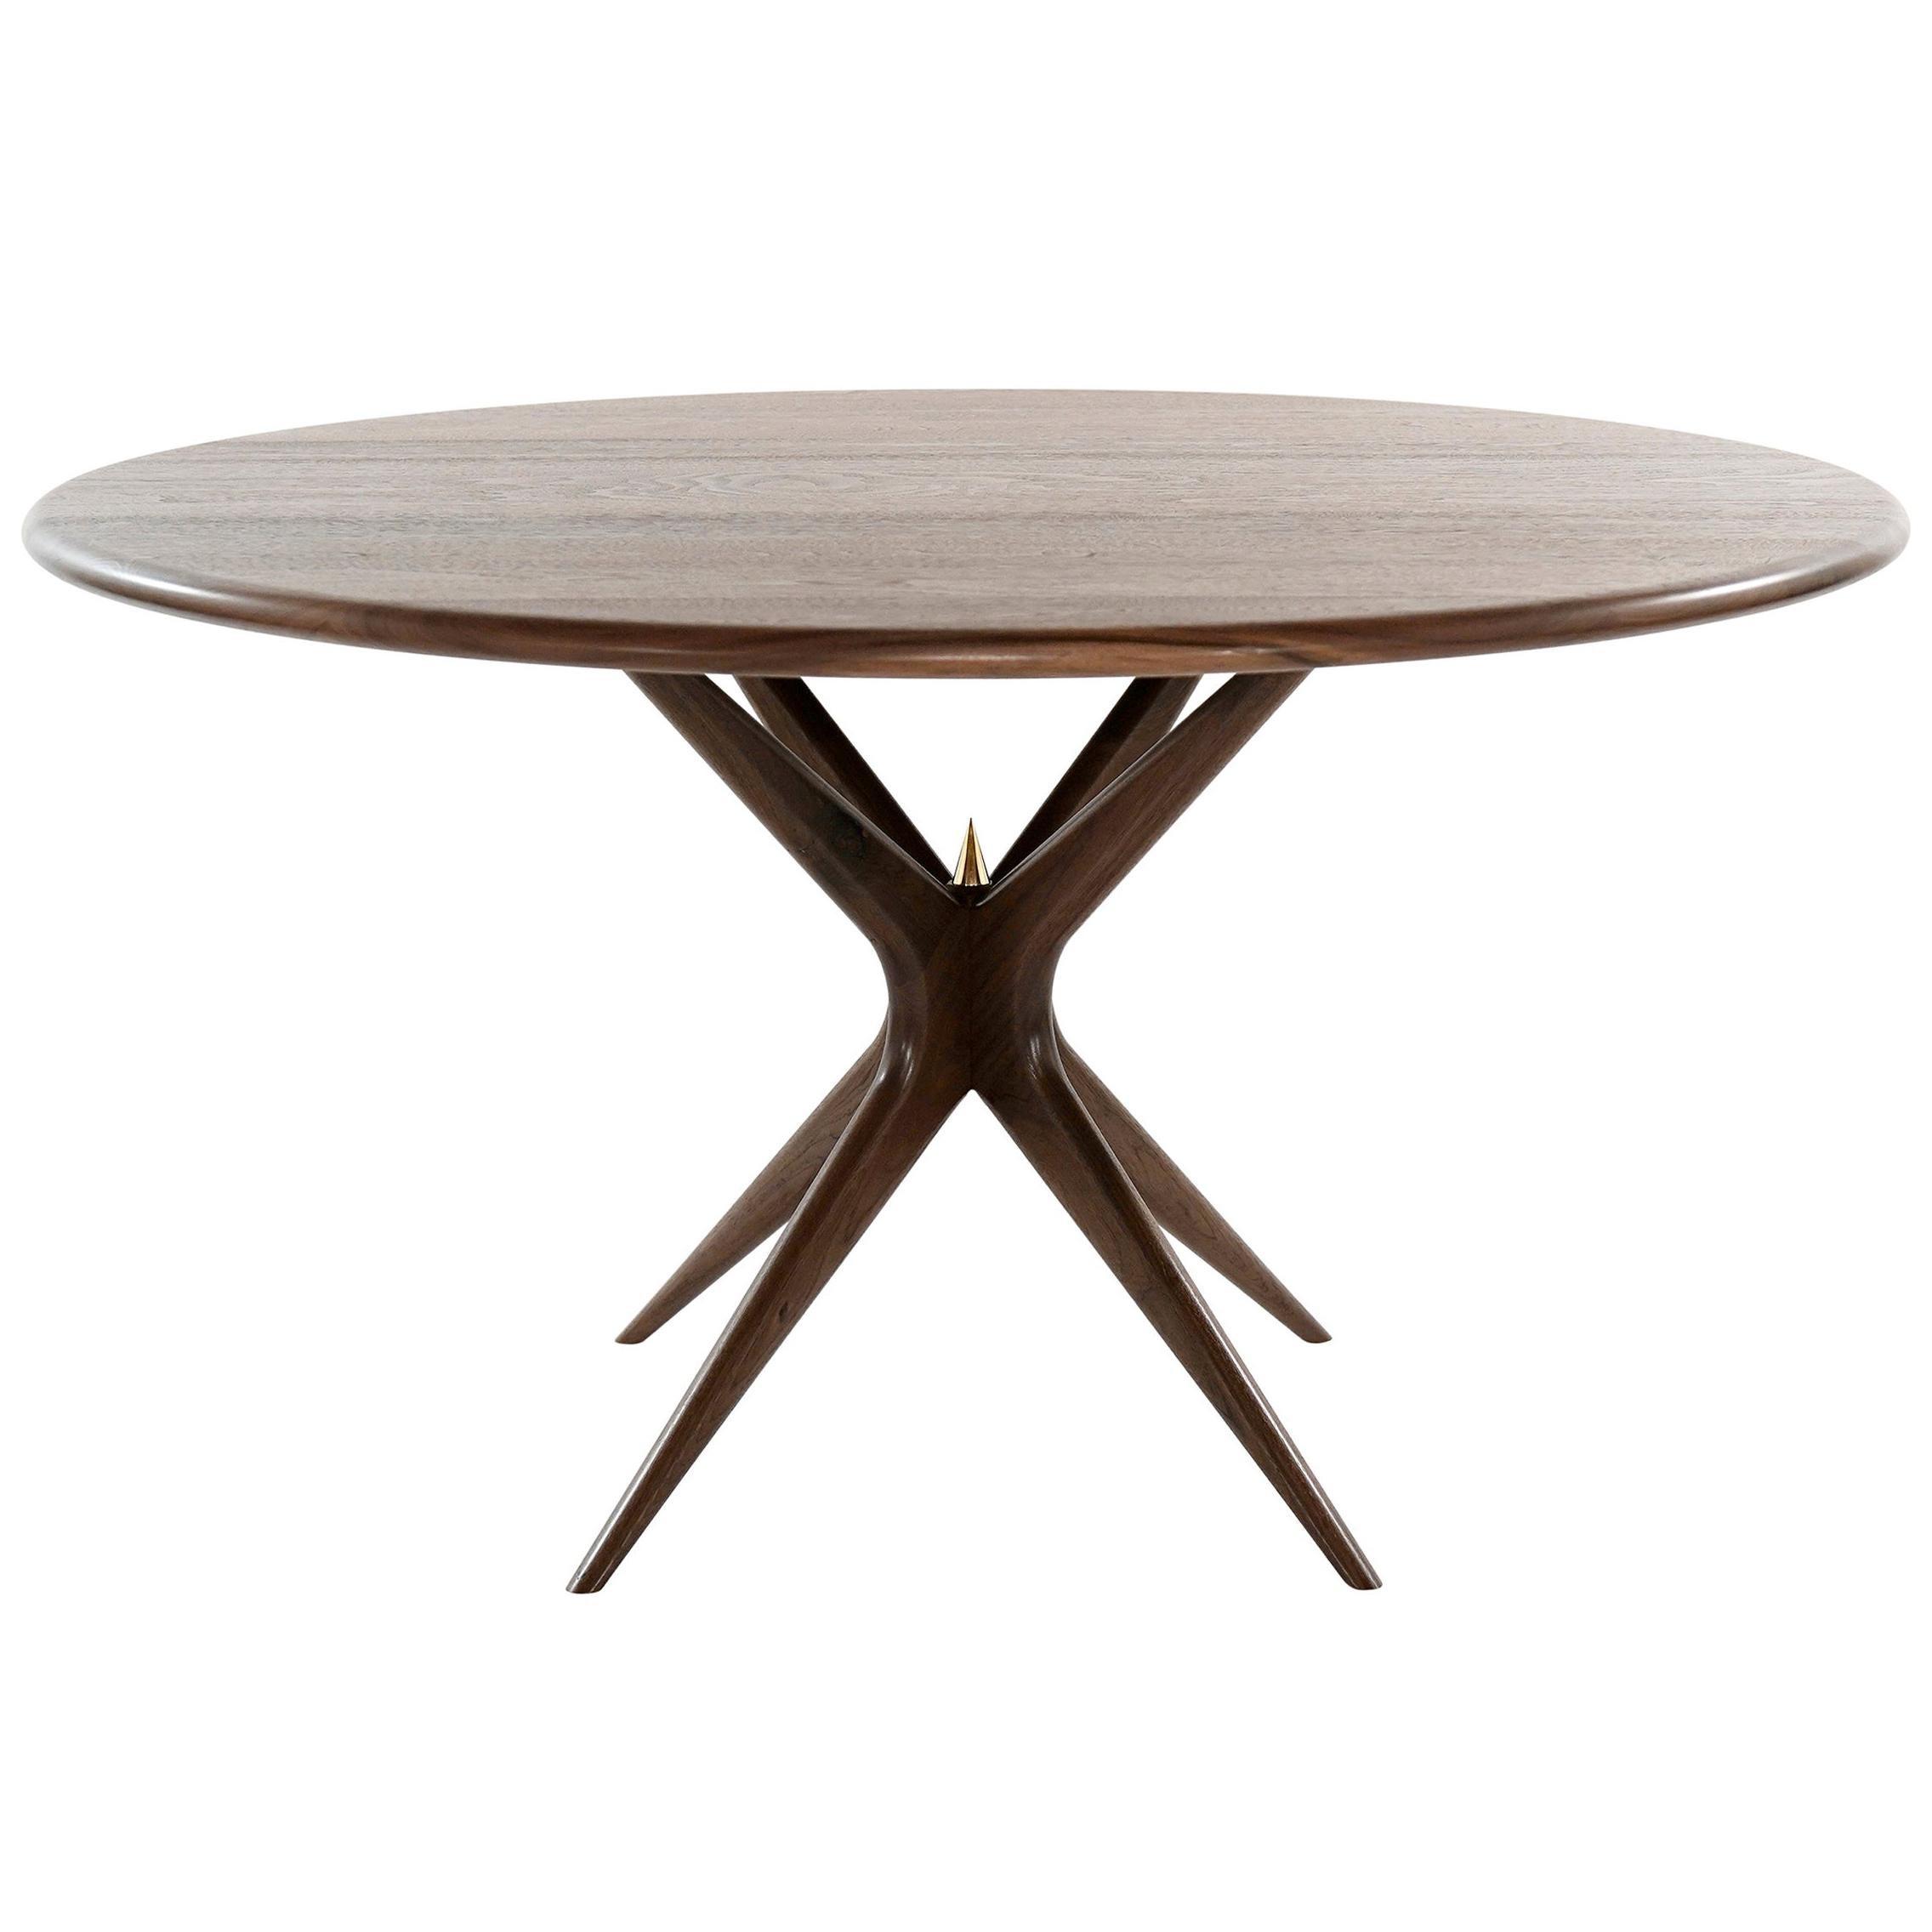 Stamford Modern's Gazelle Dining Table in Walnut